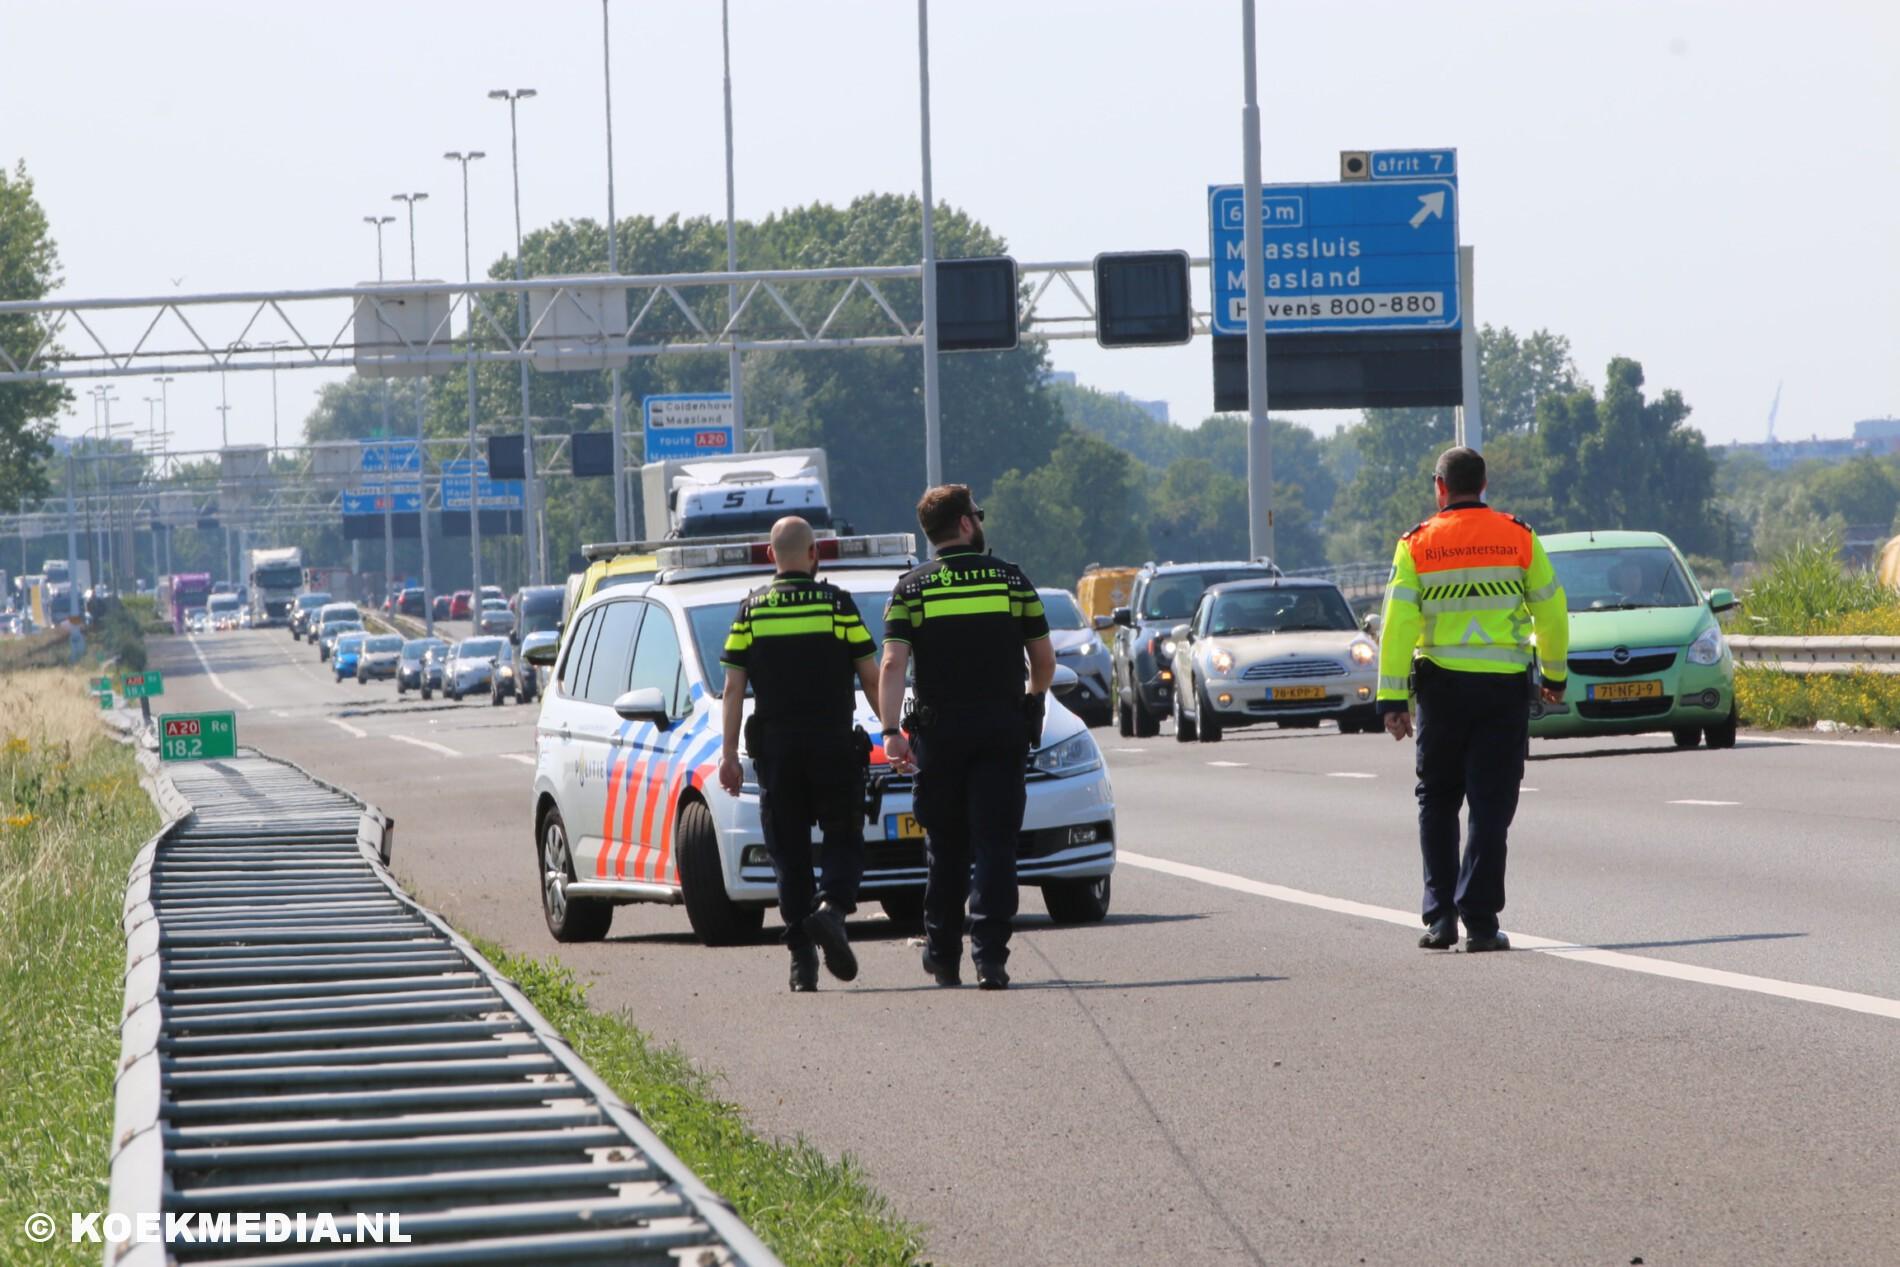 Lange file na aanrijding A20 Maasland richting Vlaardingen.